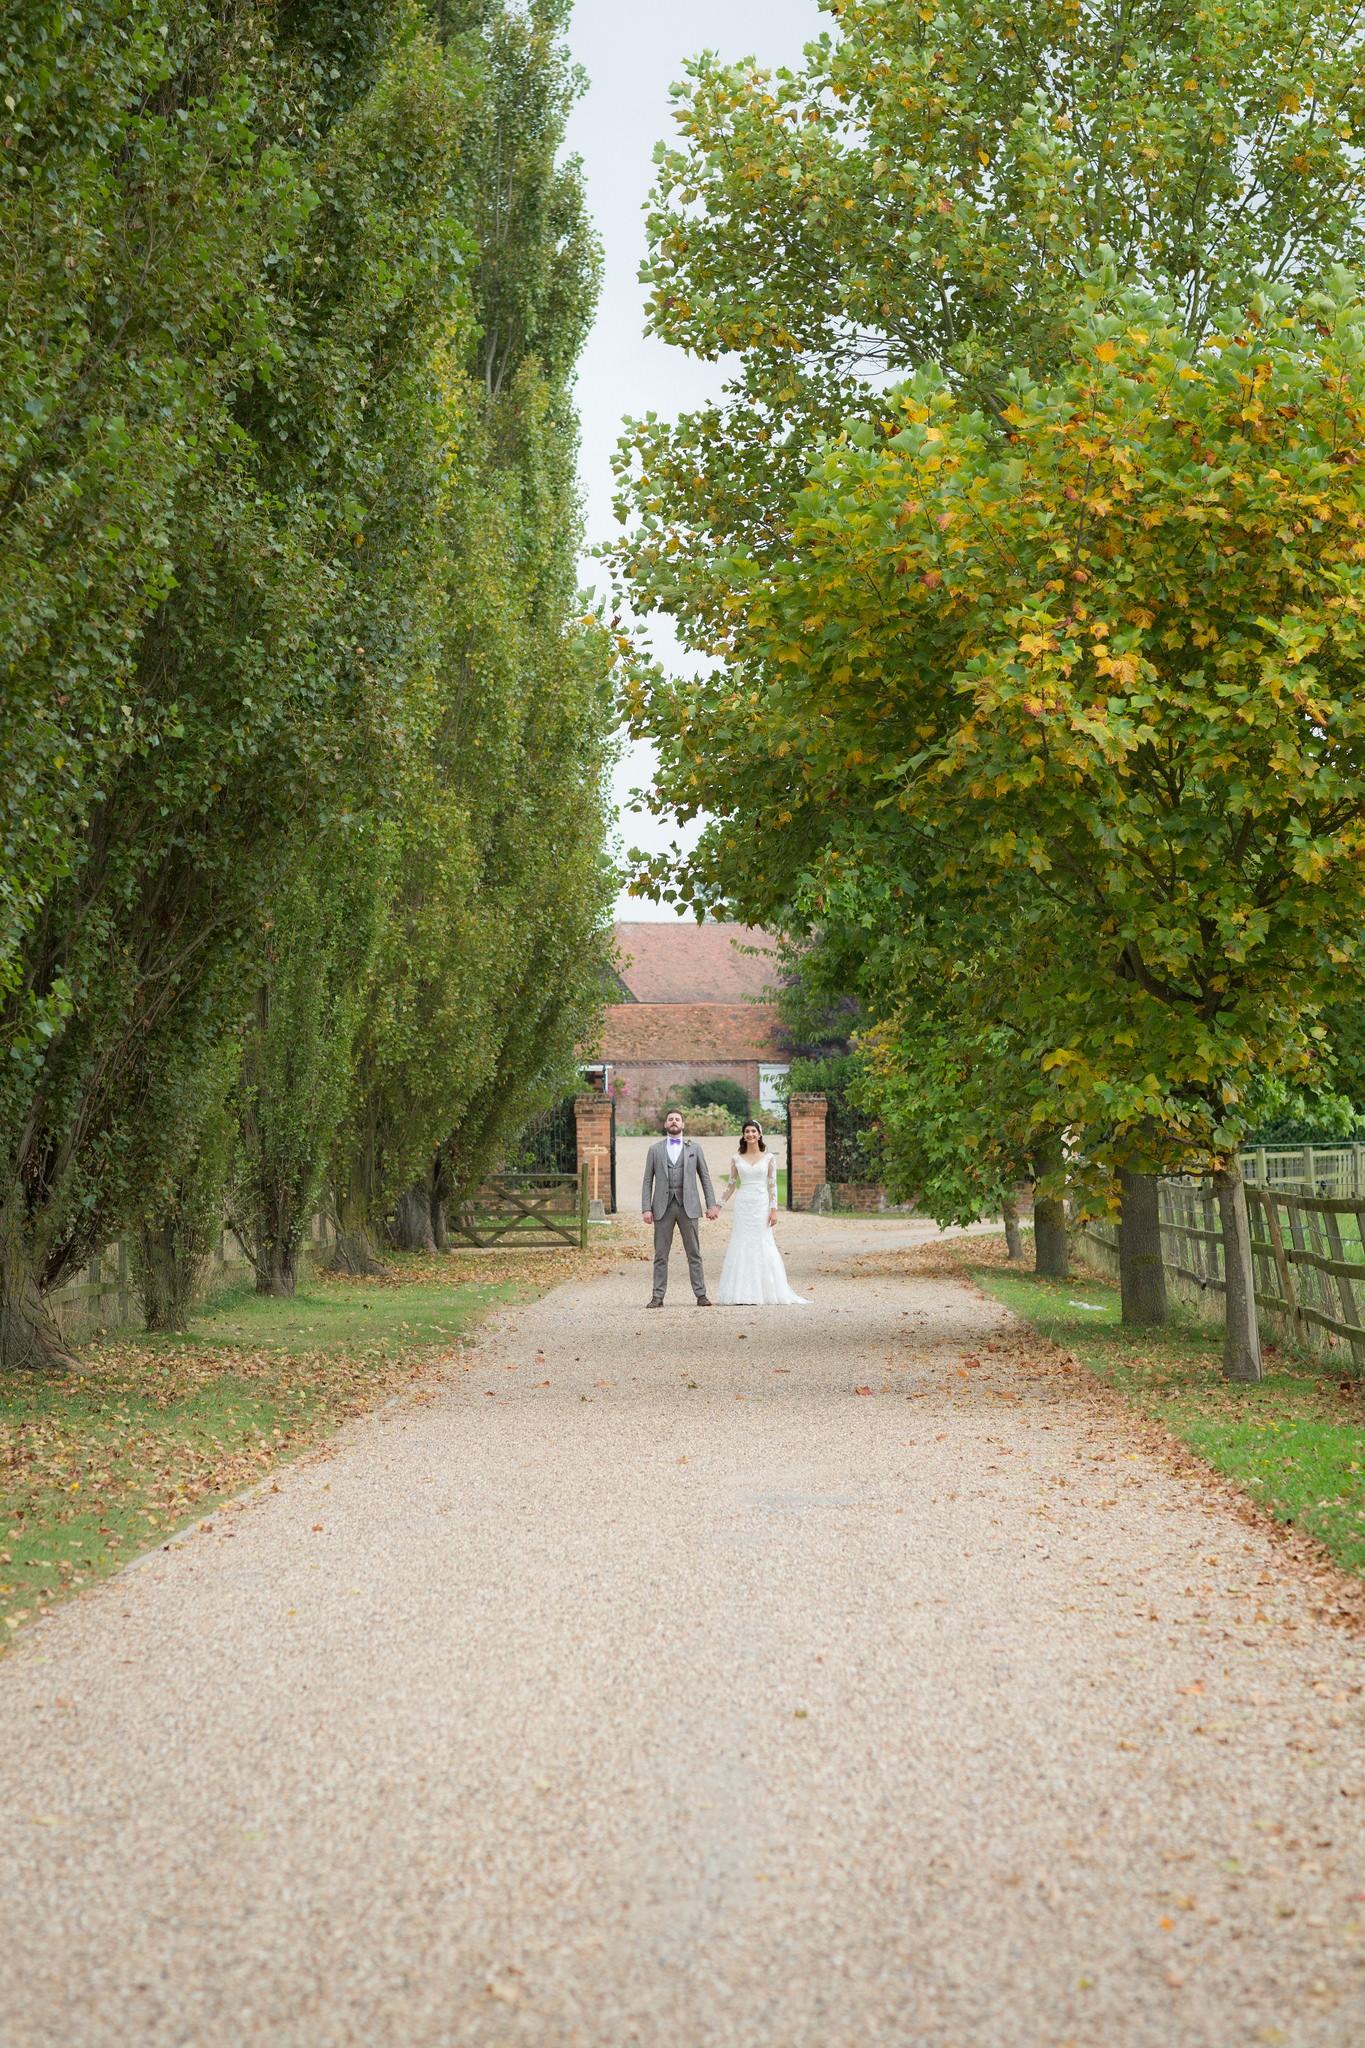 Annem & Michael. The Main Drive.